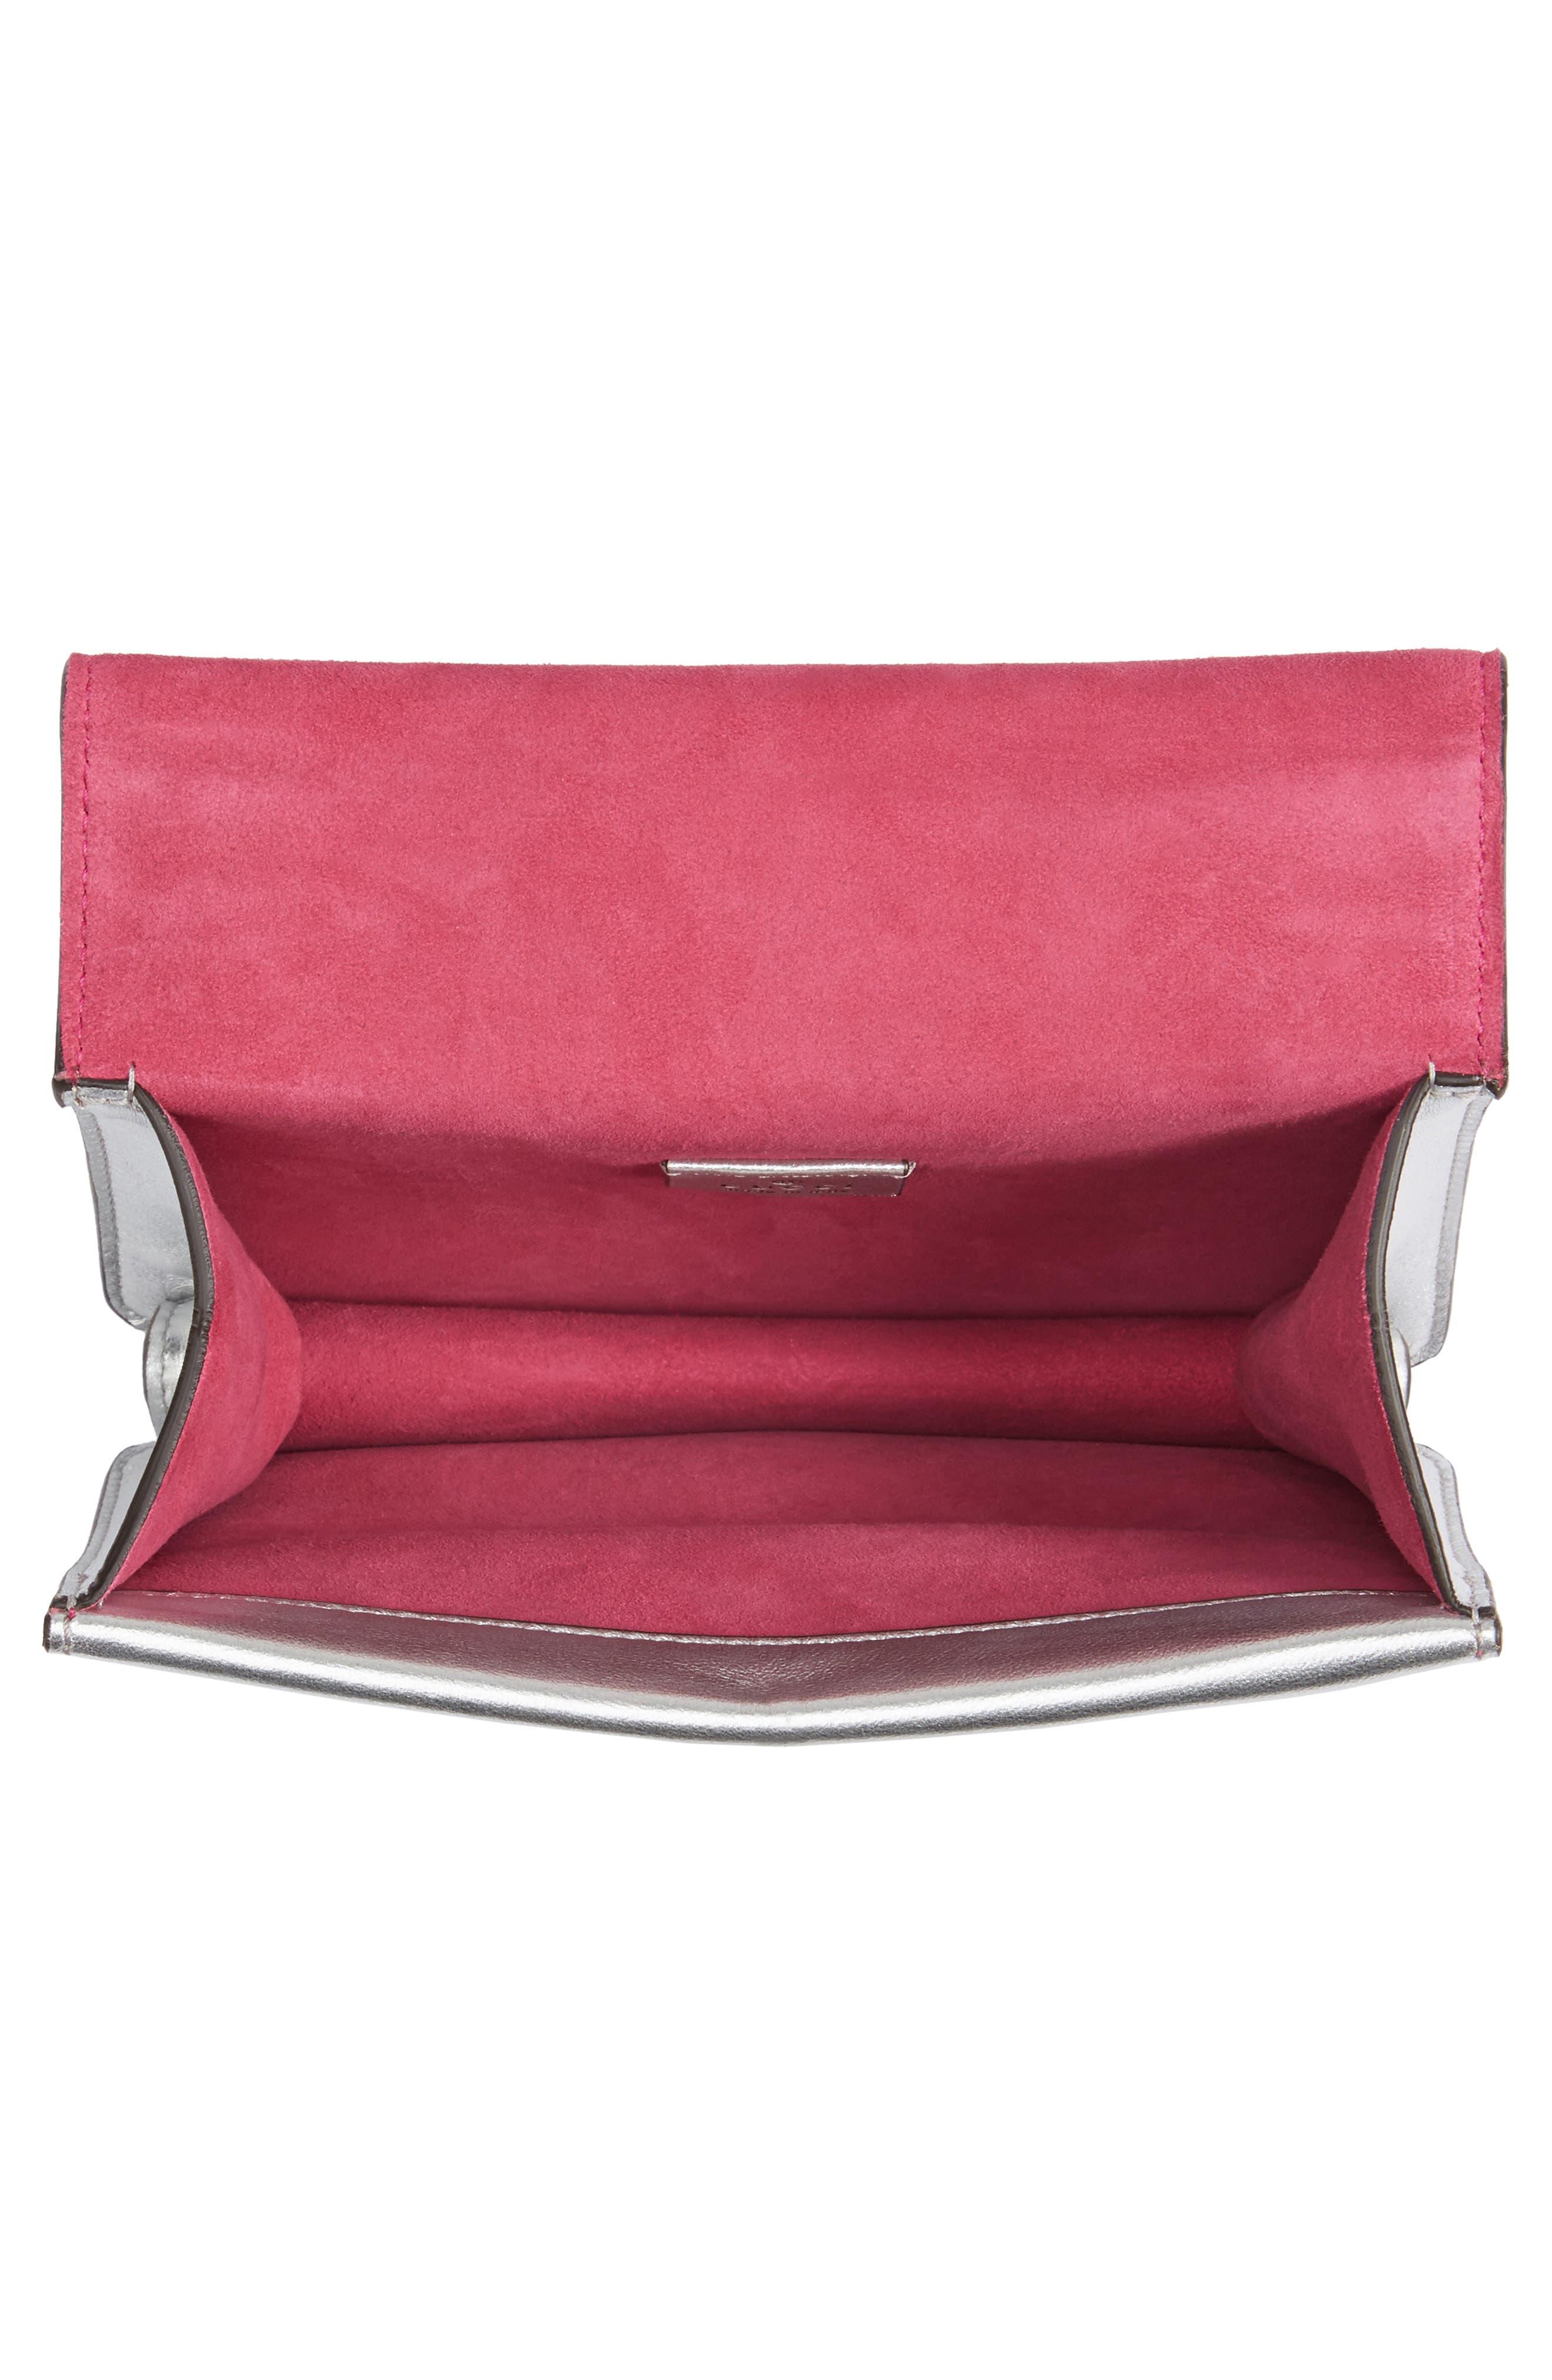 Mini Dionysus Metallic Leather Shoulder Bag,                             Alternate thumbnail 4, color,                             045